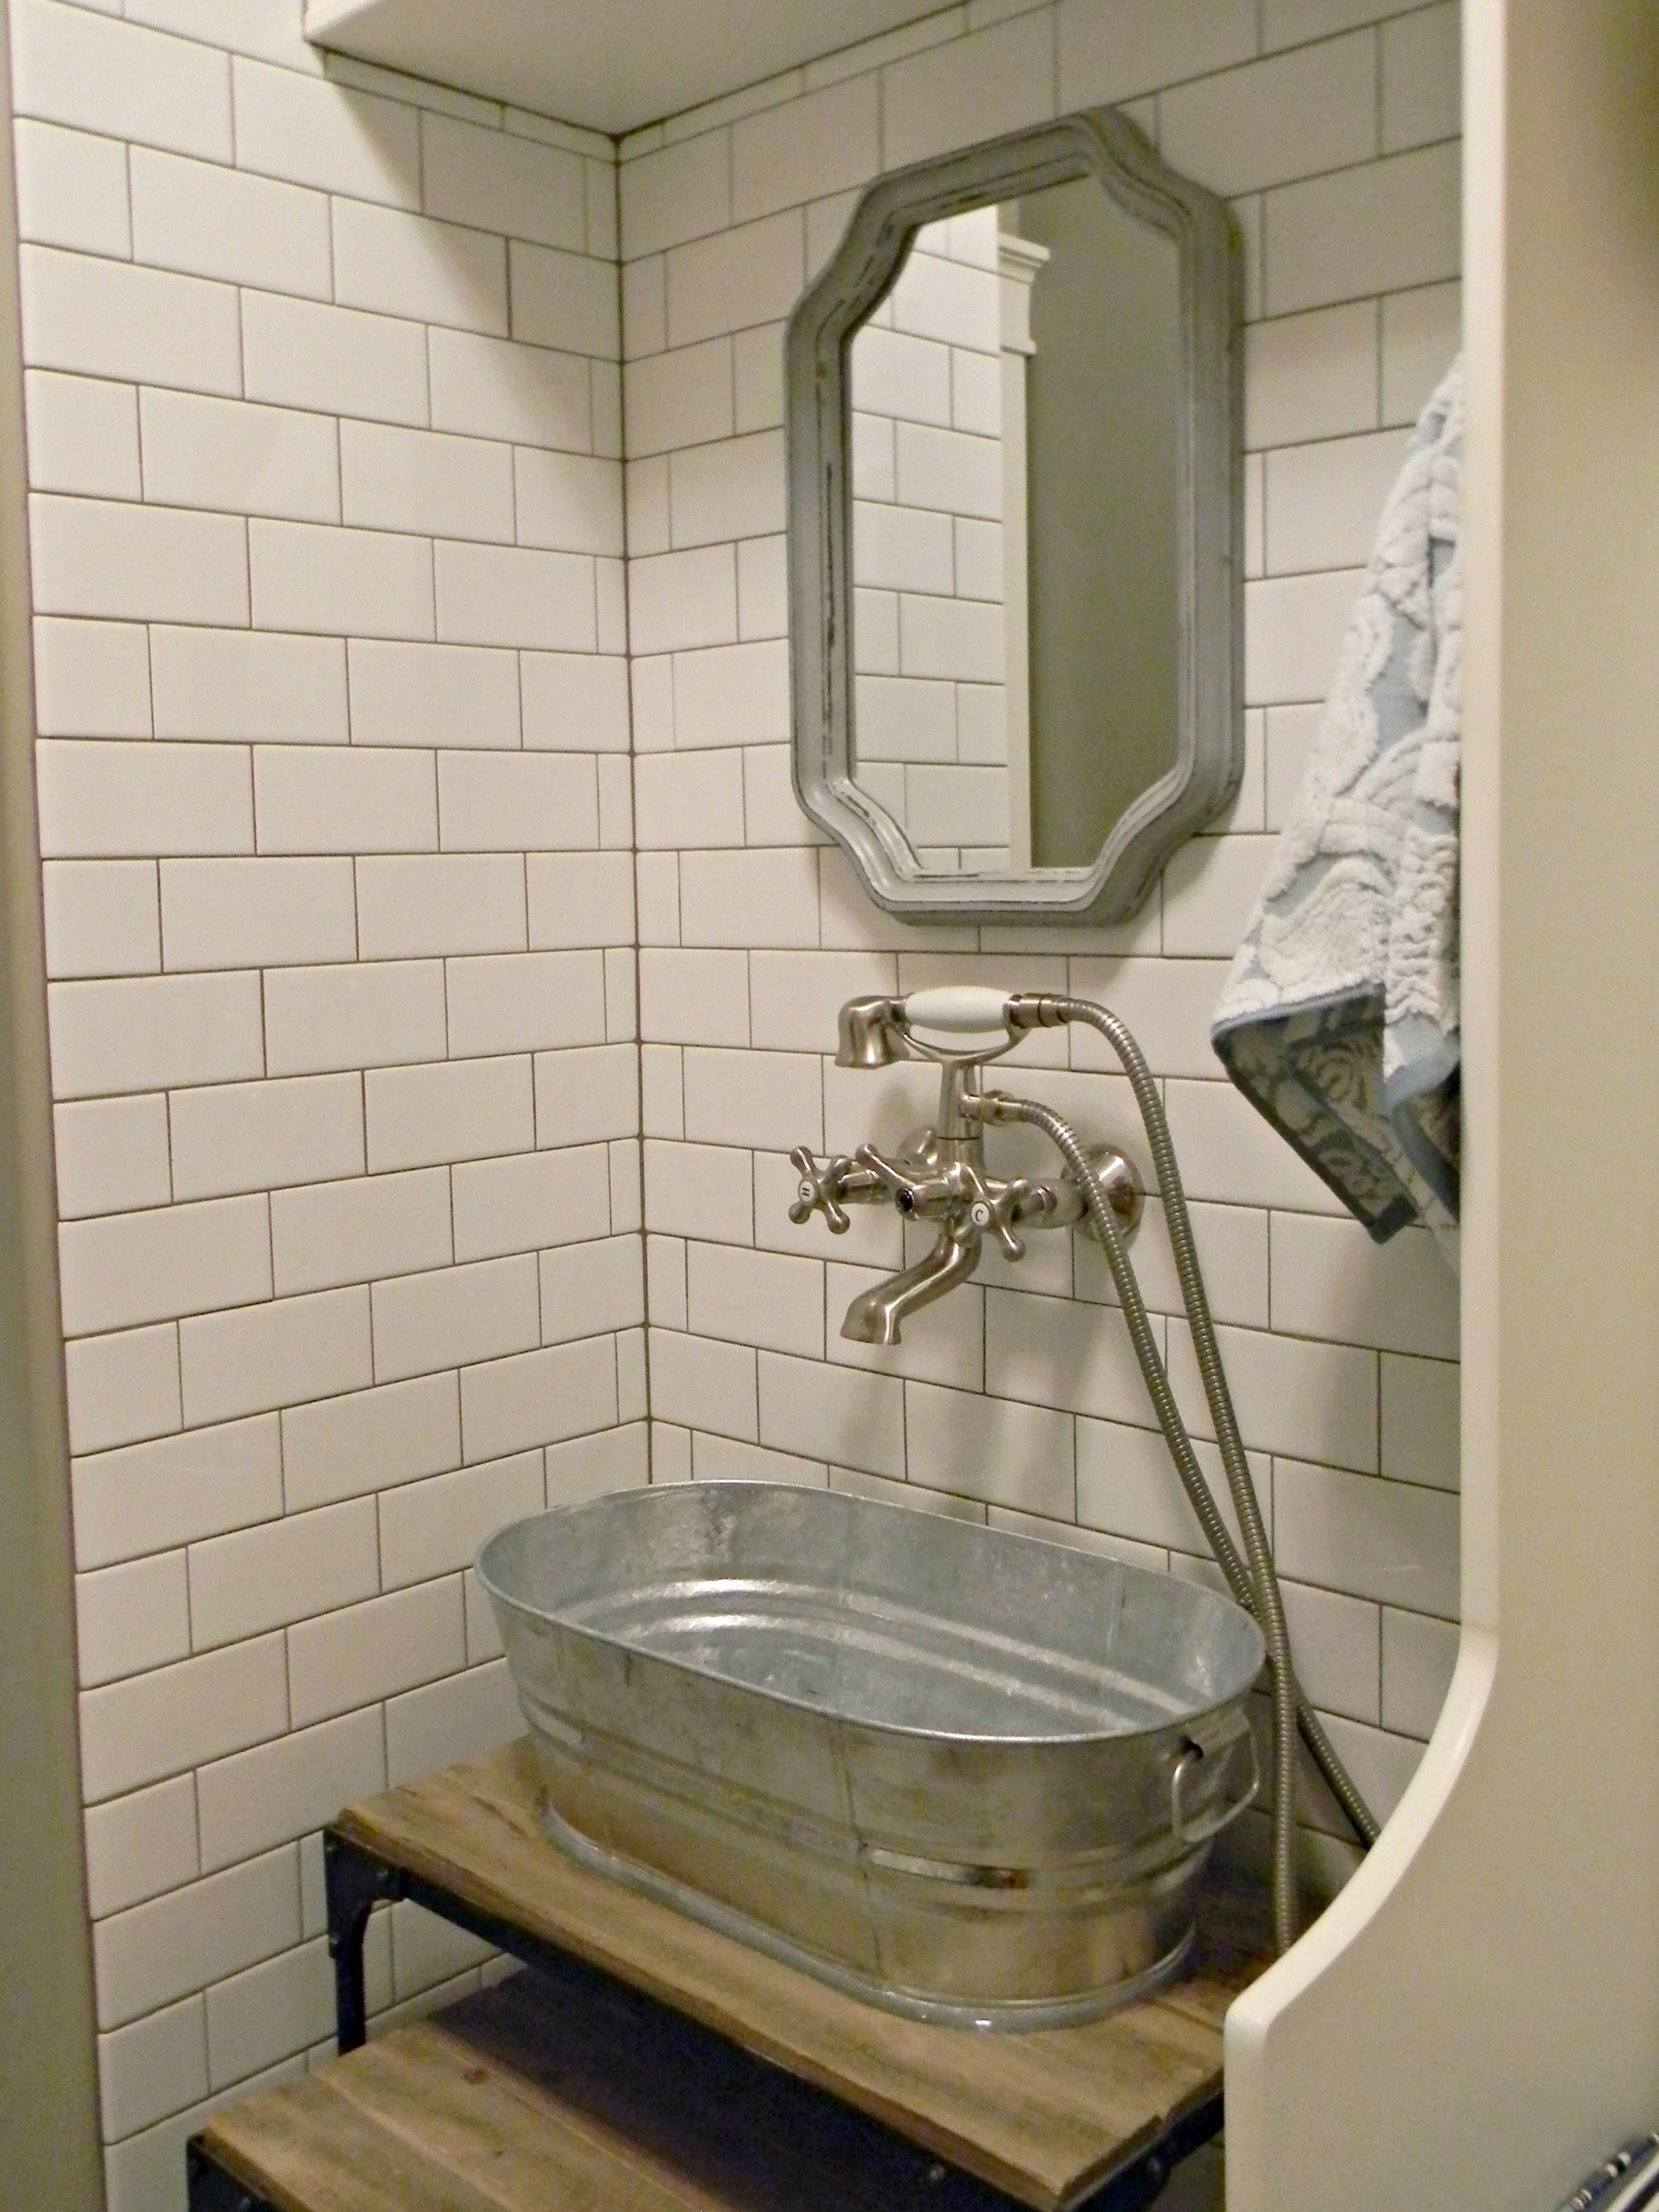 Diy Blogger House At Daybreak Dog Bath Tub Dog Washing Station